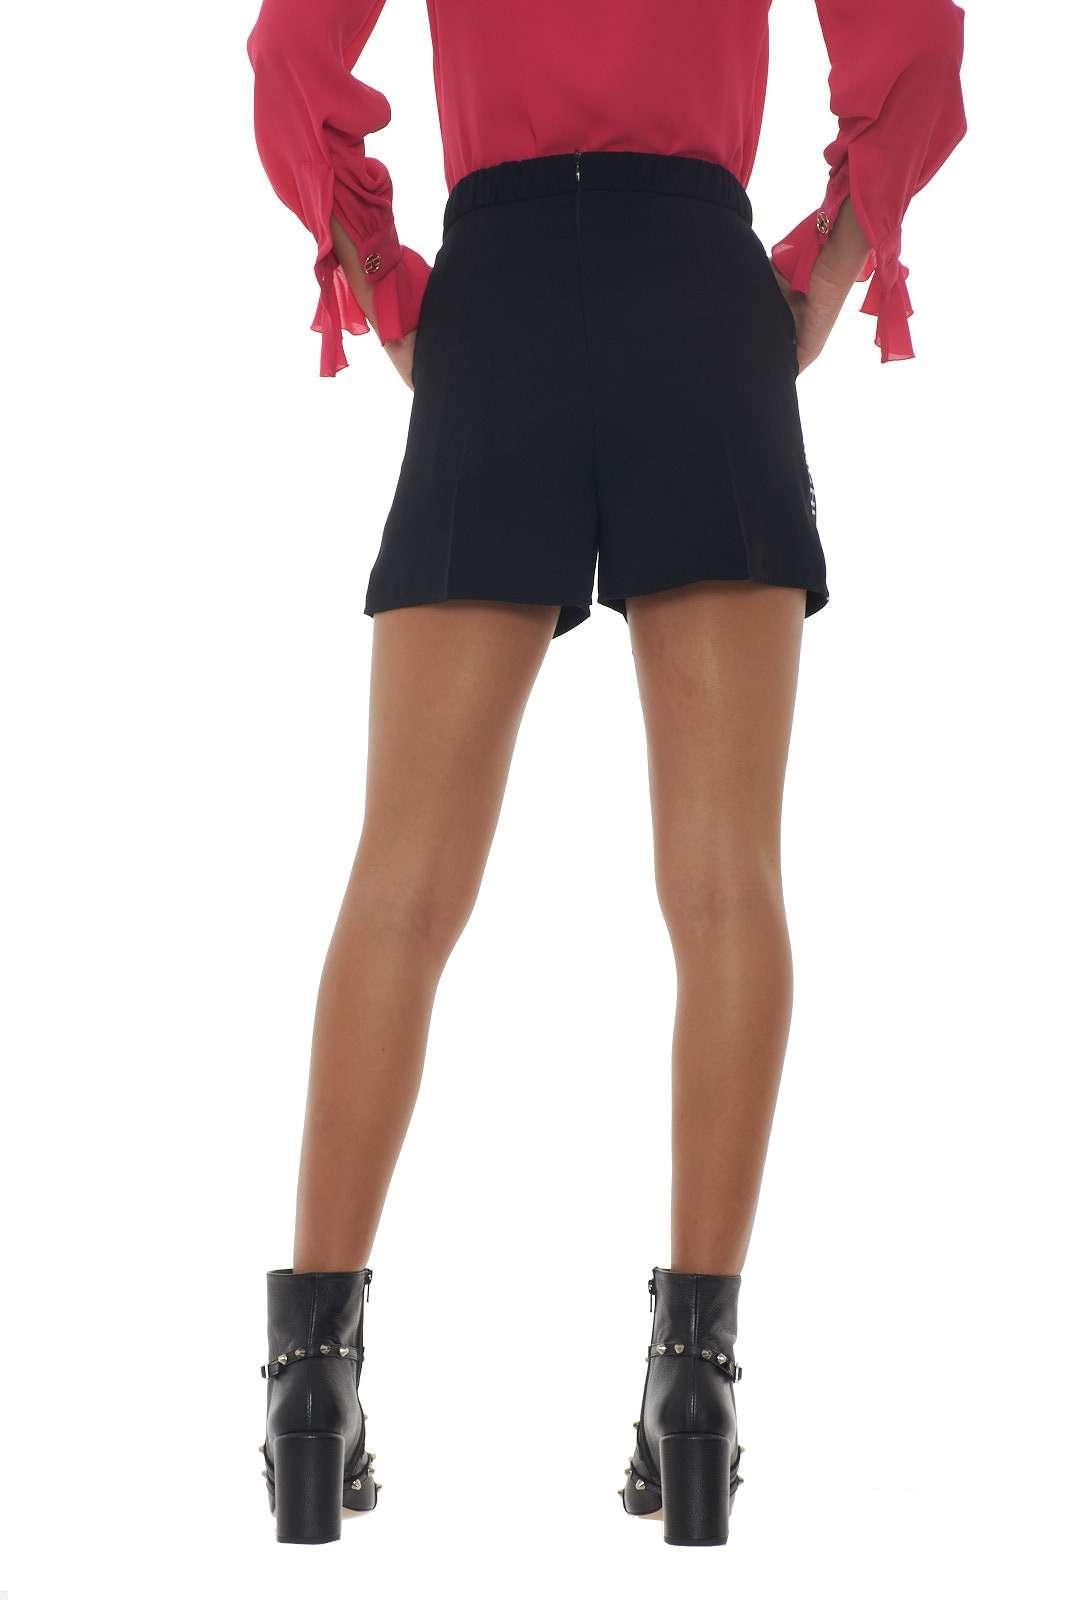 https://www.parmax.com/media/catalog/product/a/i/AI-outlet_parmax-shorts-donna-Elisabetta-Franchi-SH03496E2-C.jpg